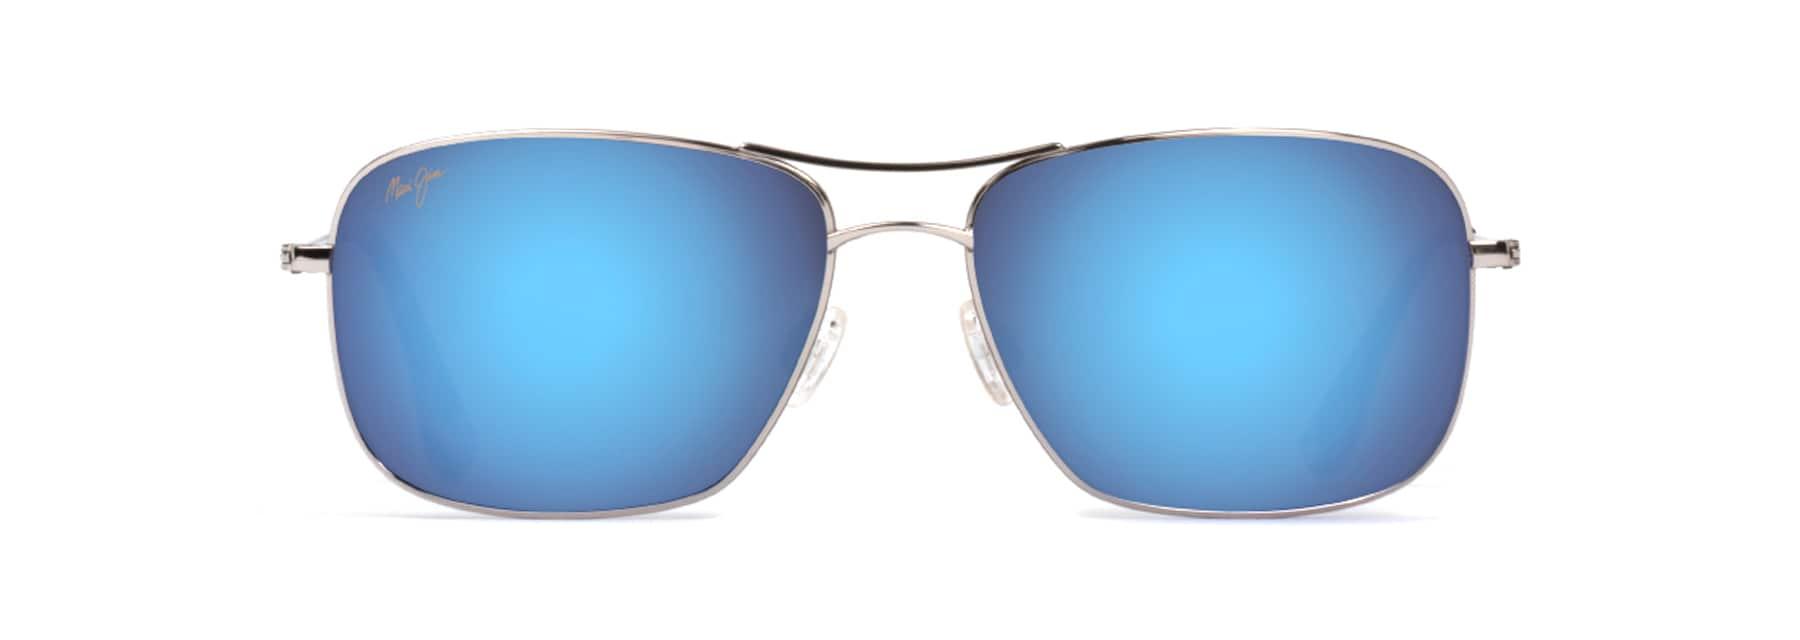 896206c179d2 Wiki Wiki Polarized Sunglasses   Maui Jim®